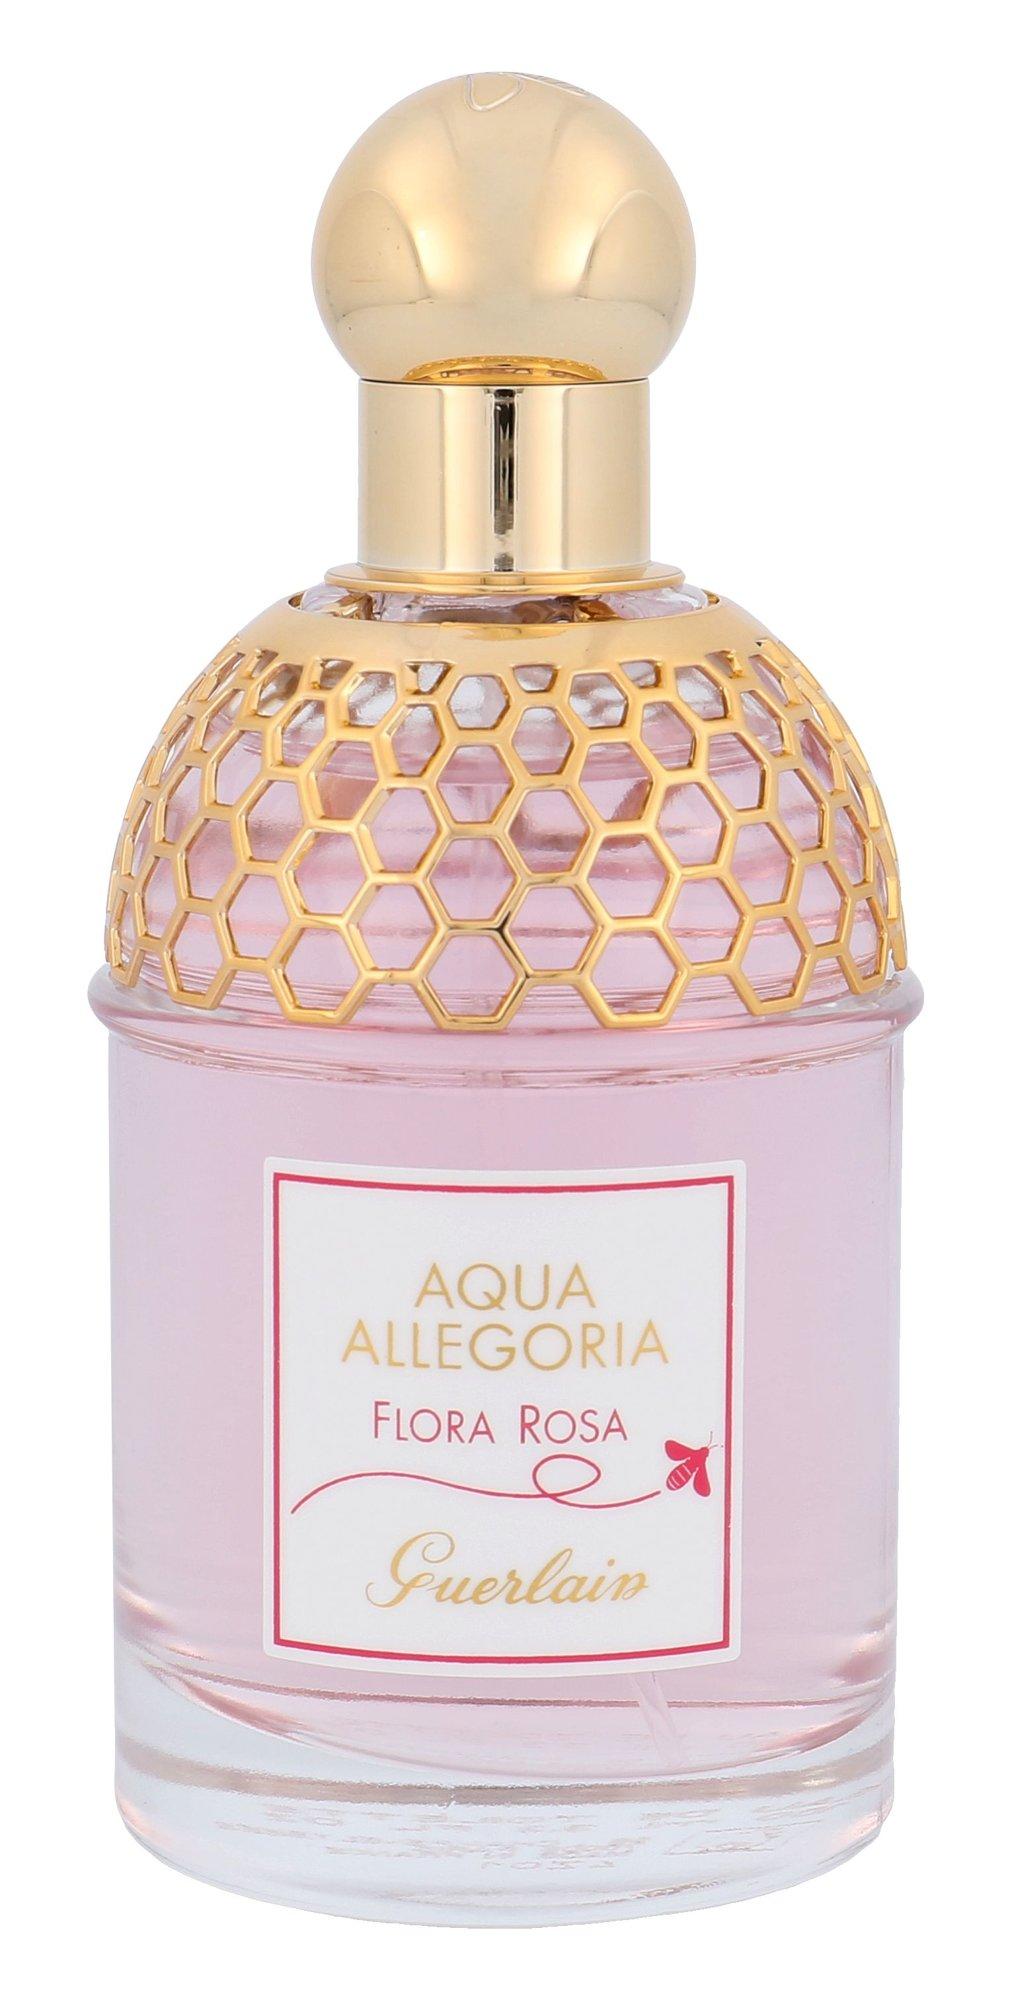 Guerlain Aqua Allegoria Flora Rosa EDT 100ml